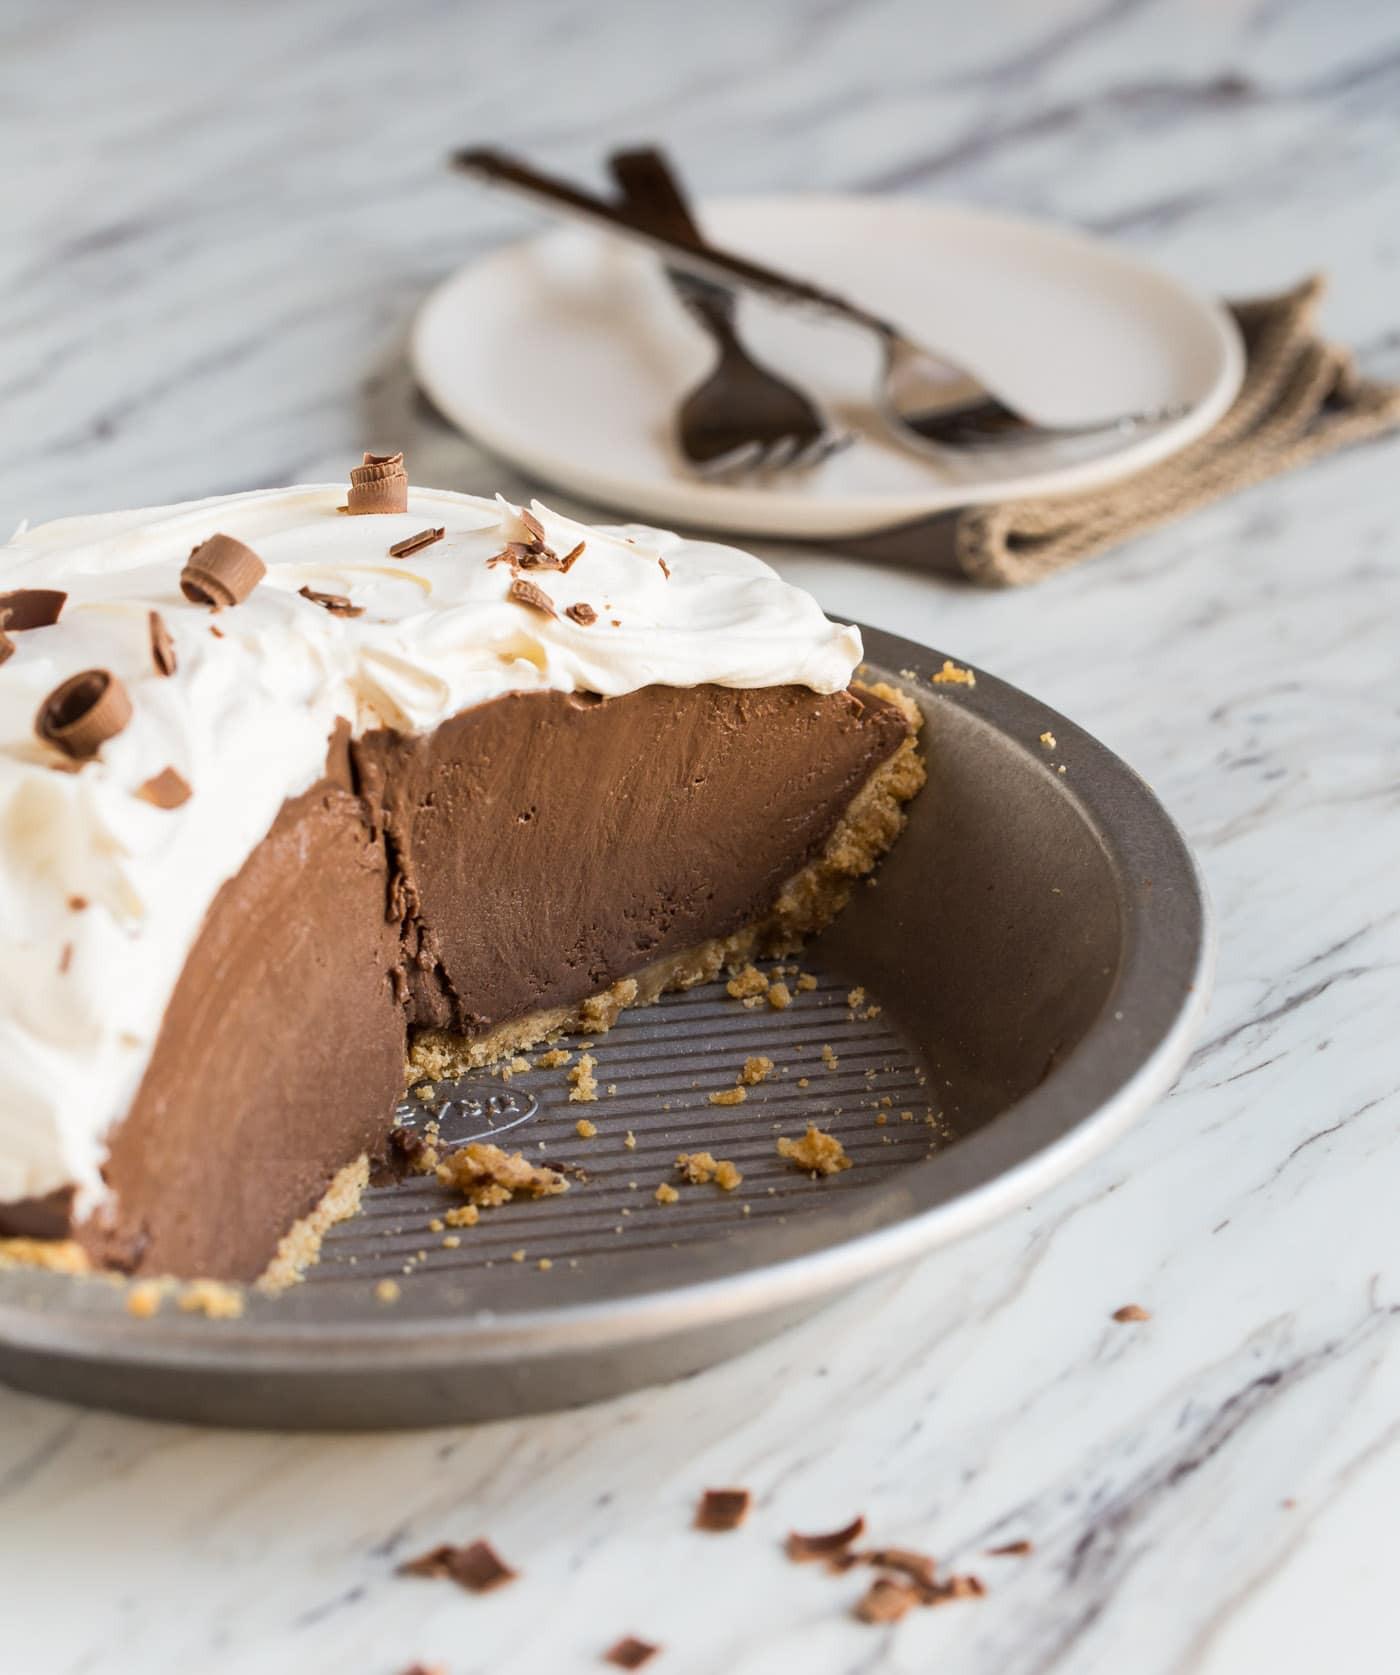 Chocolate Pie With Cocoa  Chocolate Pie Garnish with Lemon